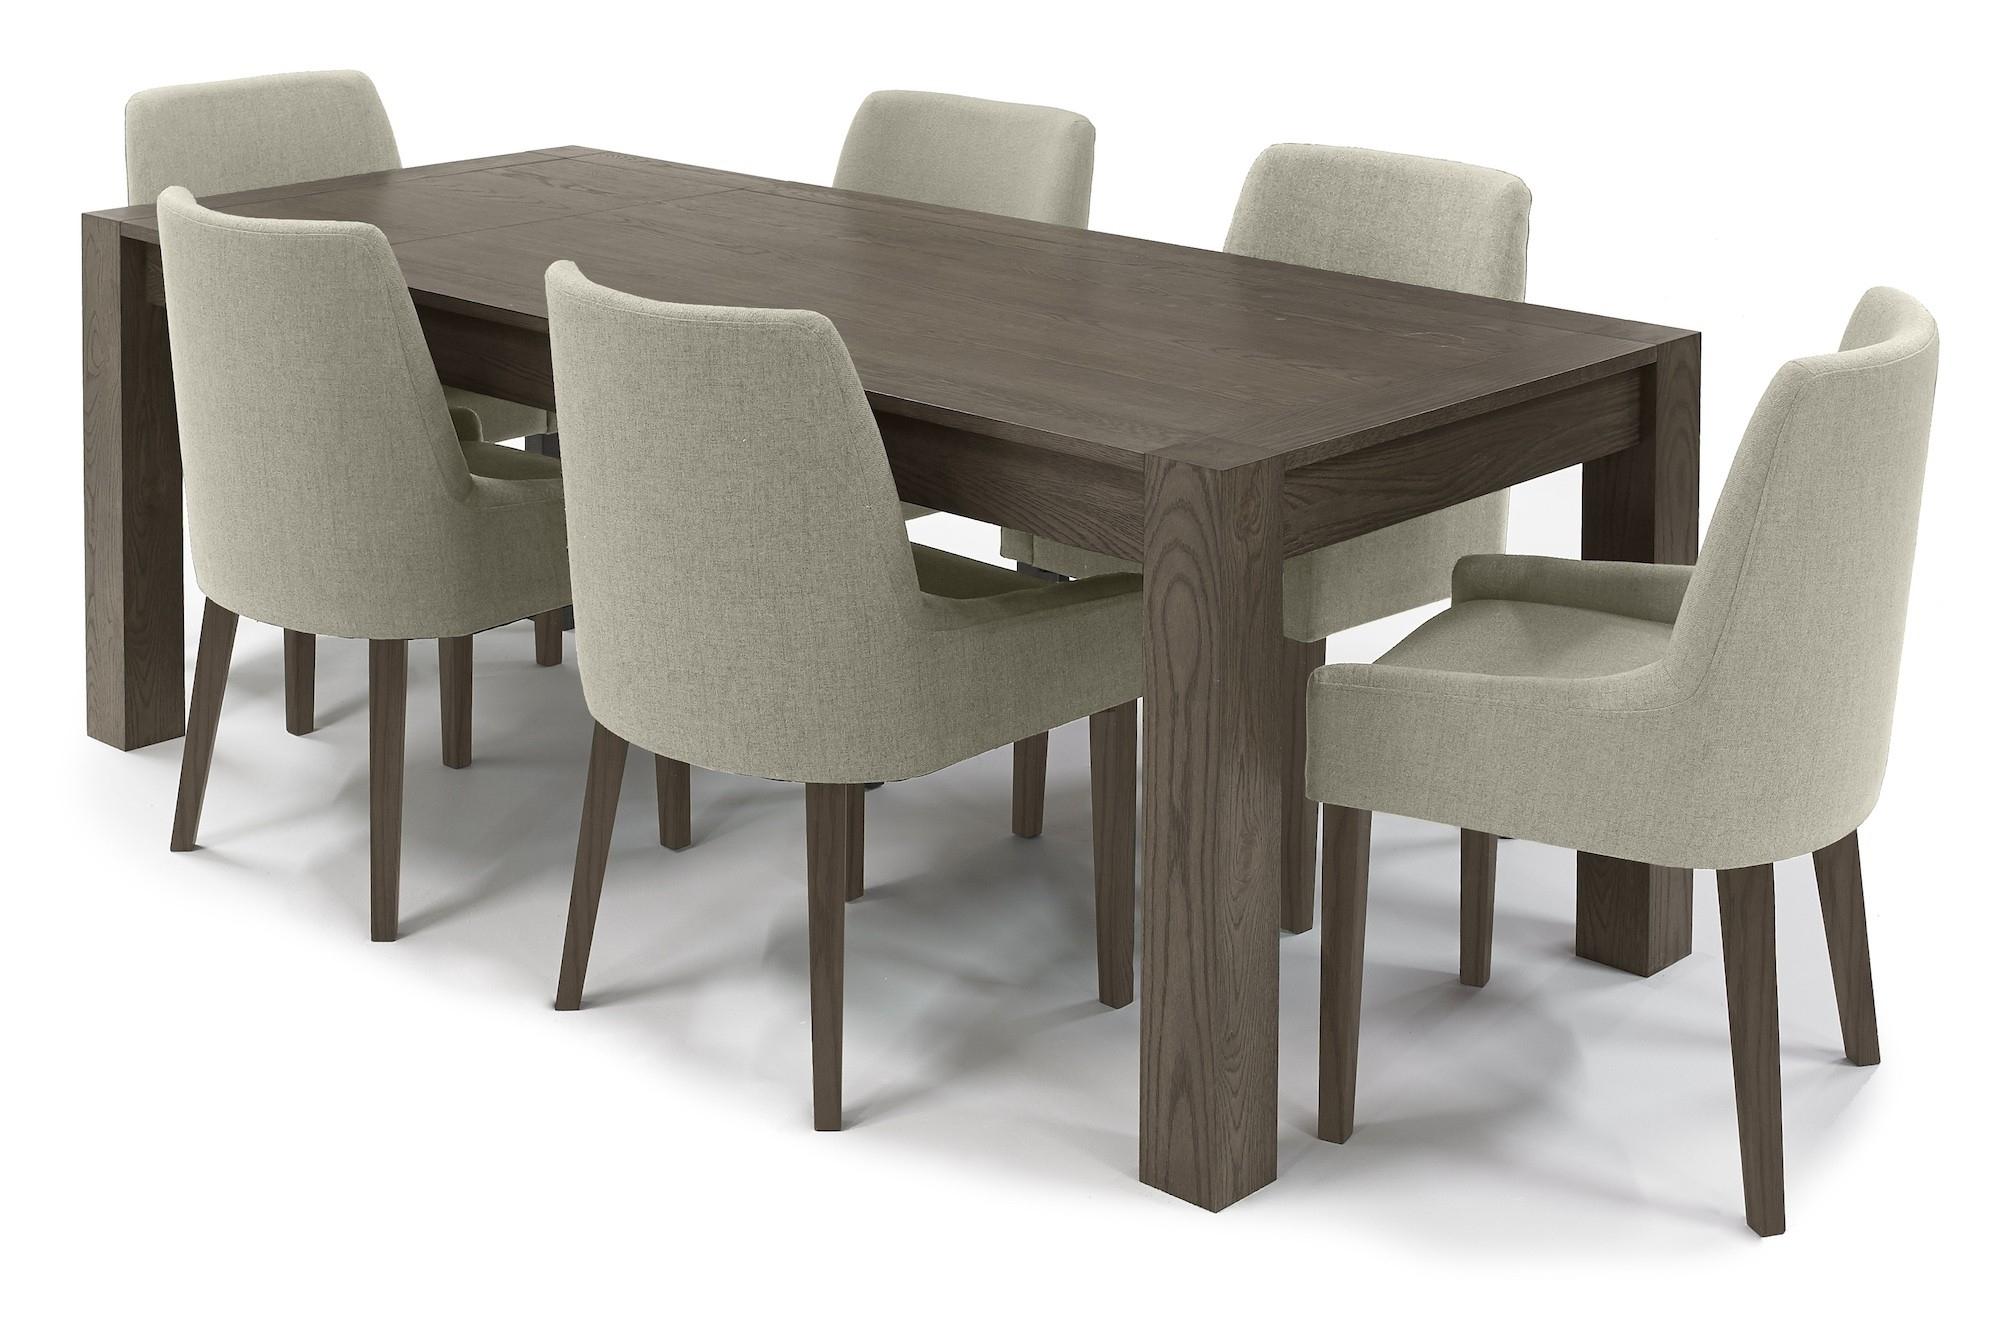 Favorite Turin Dark Oak Dining Table Medium 4 6 Seater End Extension Dining Regarding Dark Dining Tables (View 6 of 25)